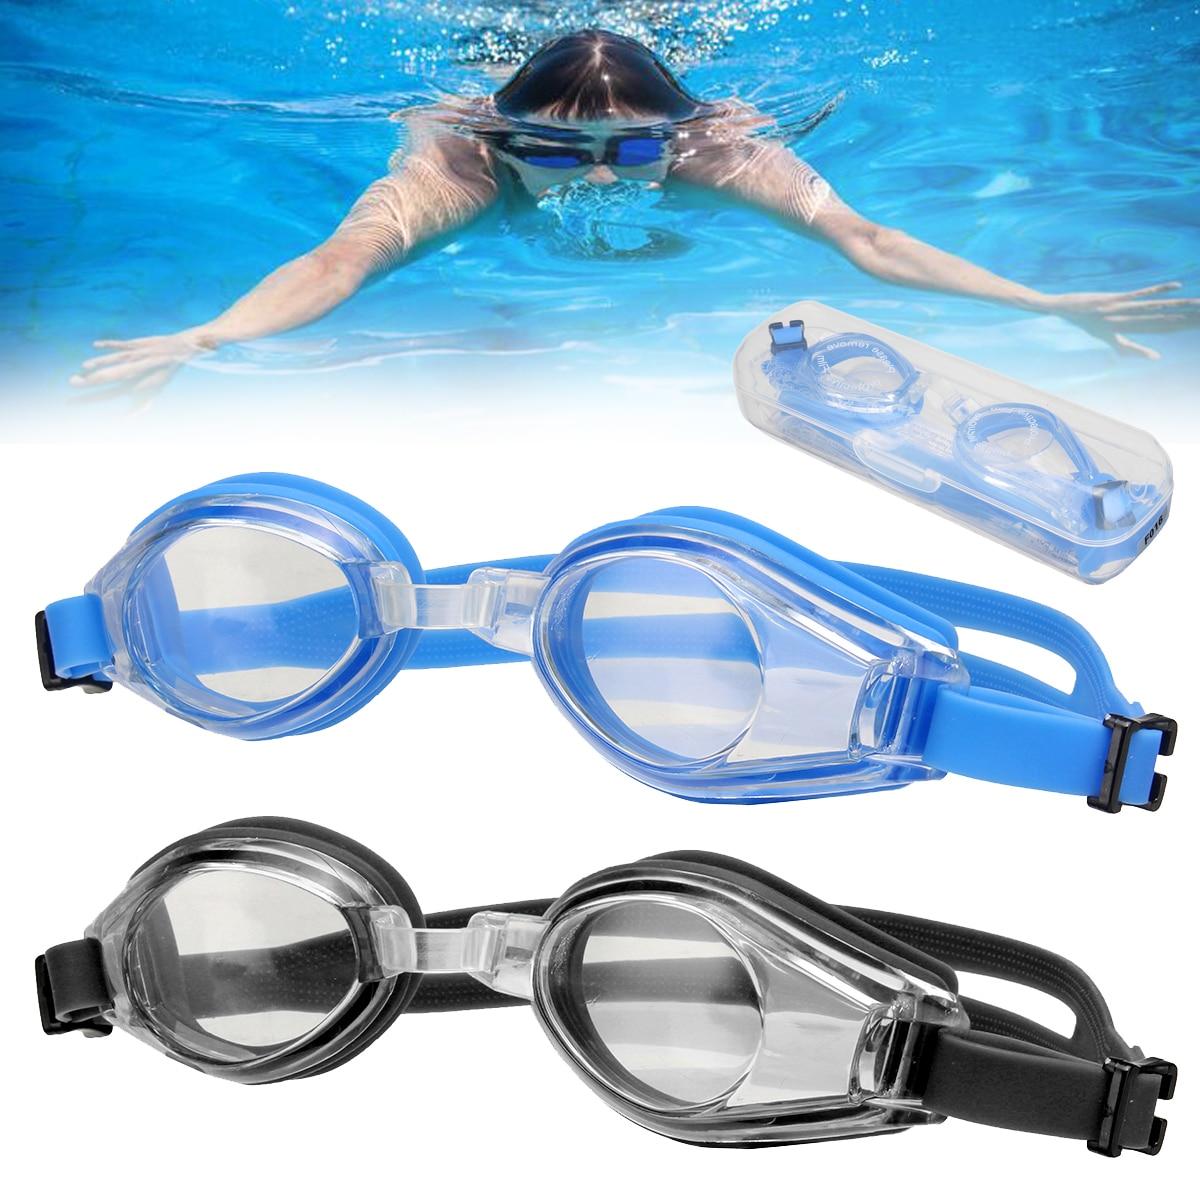 Anti Fog Swimming Goggles Sports Eyewear Swimming glasses for Men Women Boys Girls Adult ...